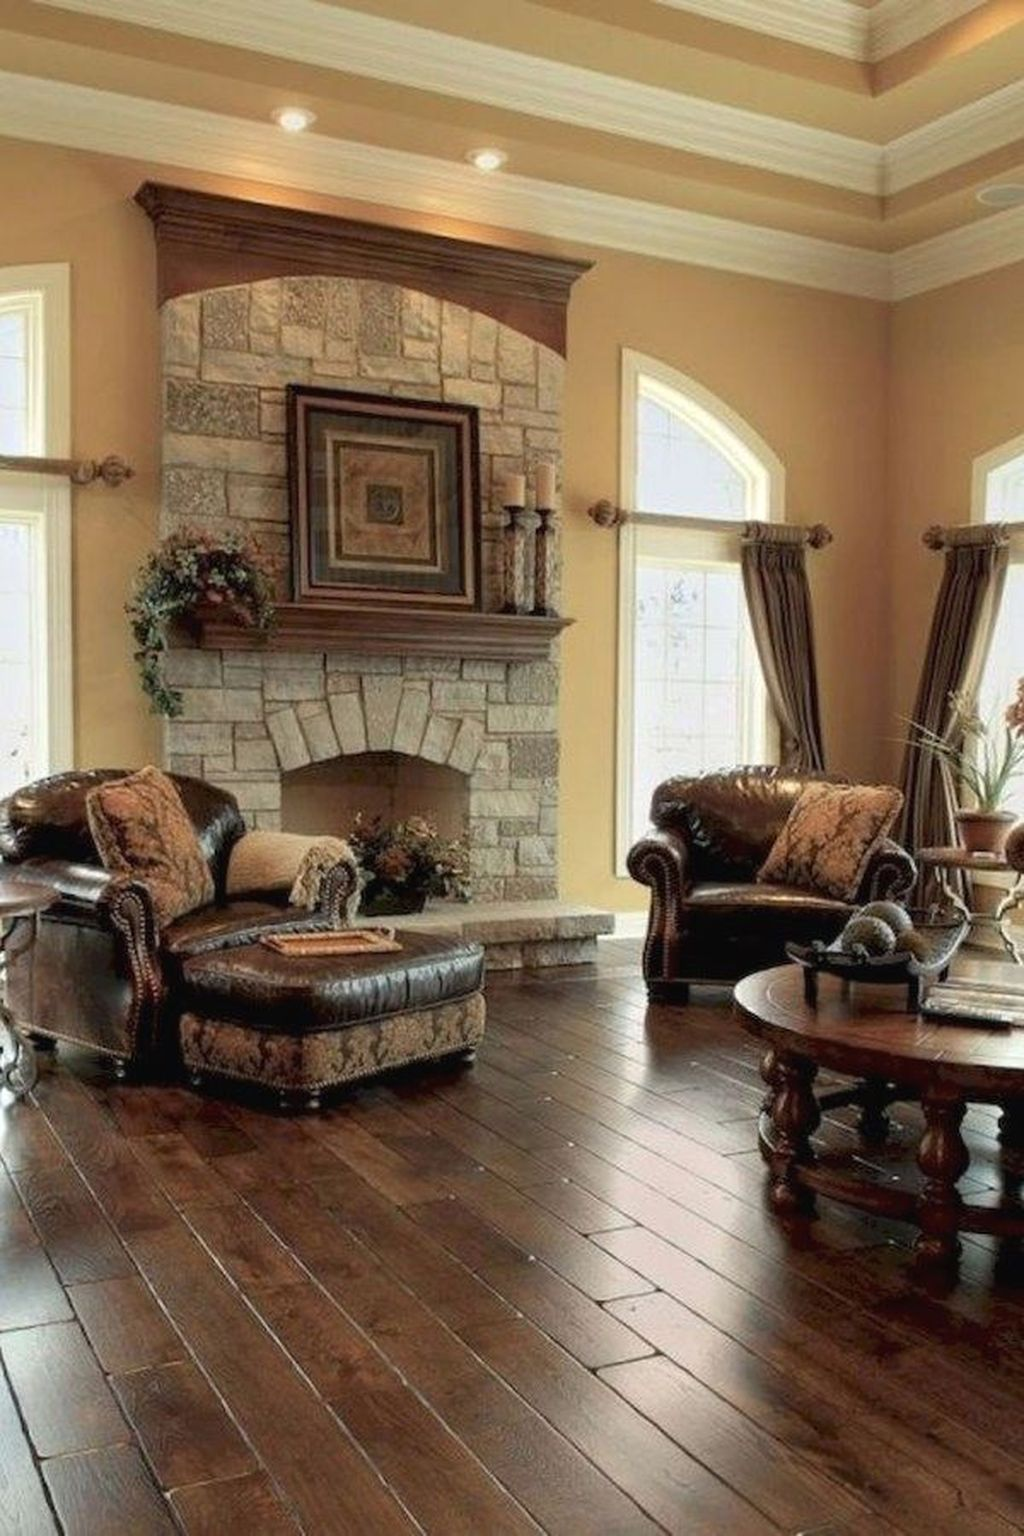 Stunning Italian Rustic Decor Ideas For Your Living Room 17